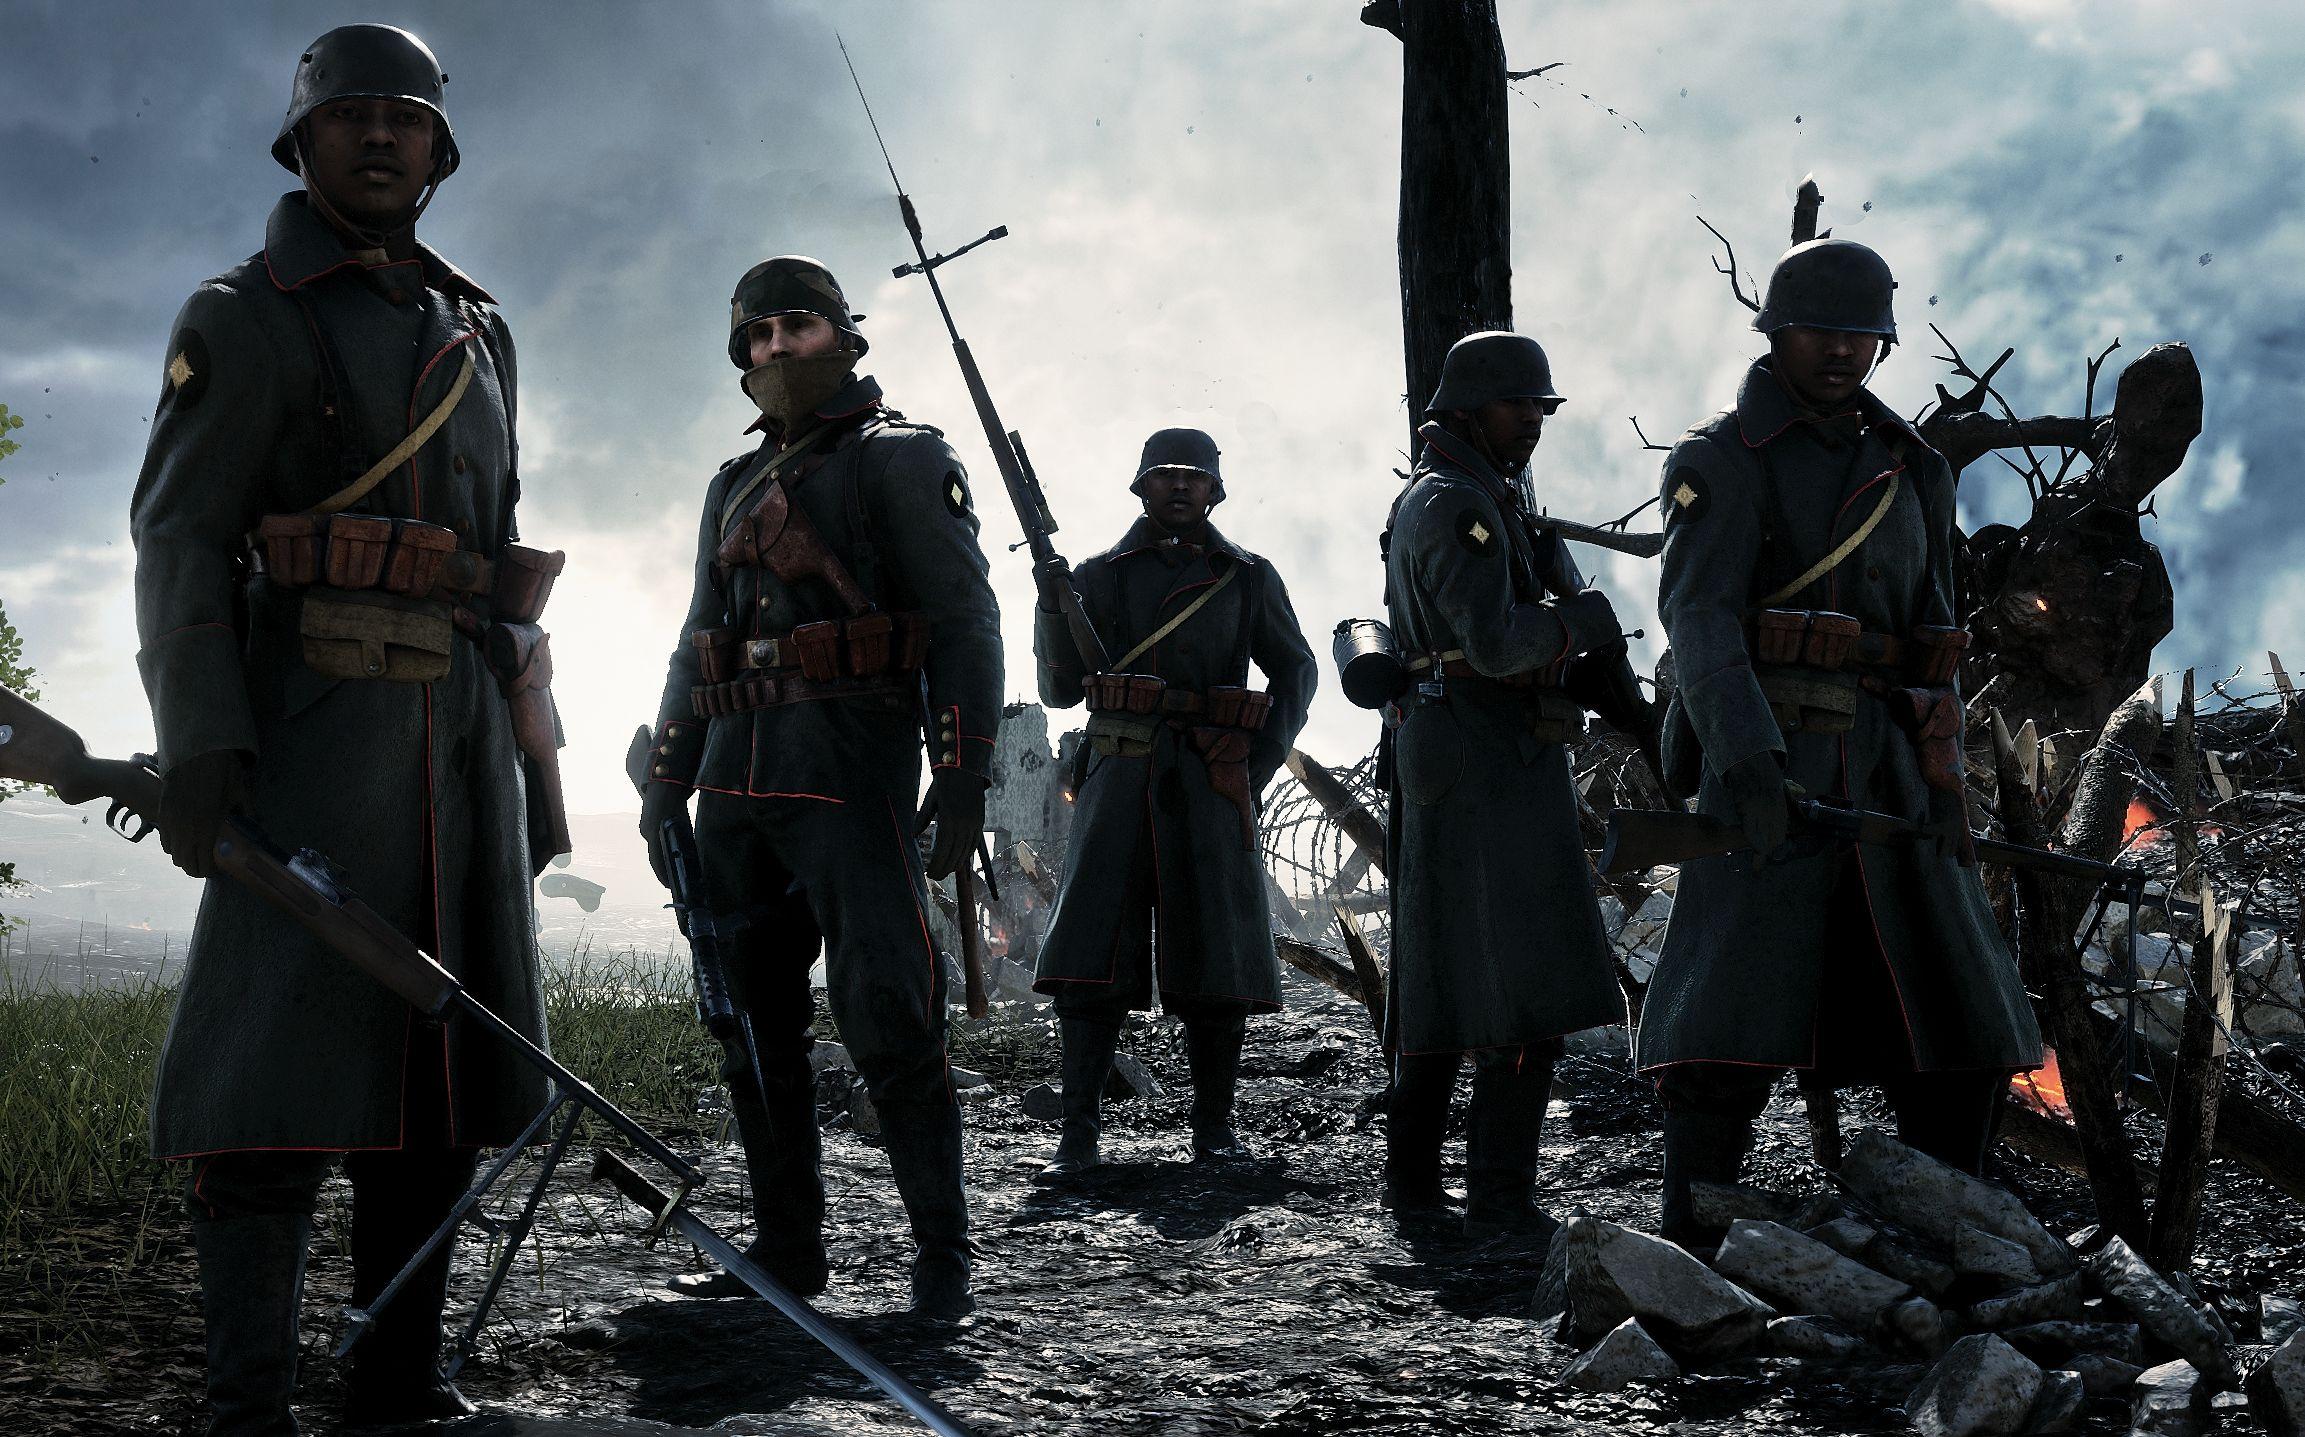 Battlefield 1 4k Ultra Tapeta Hd: 战地一表情包-战地一萌新表情包_战地1医疗兵表情包_战地薯条_战地一把_战地一武器表情包